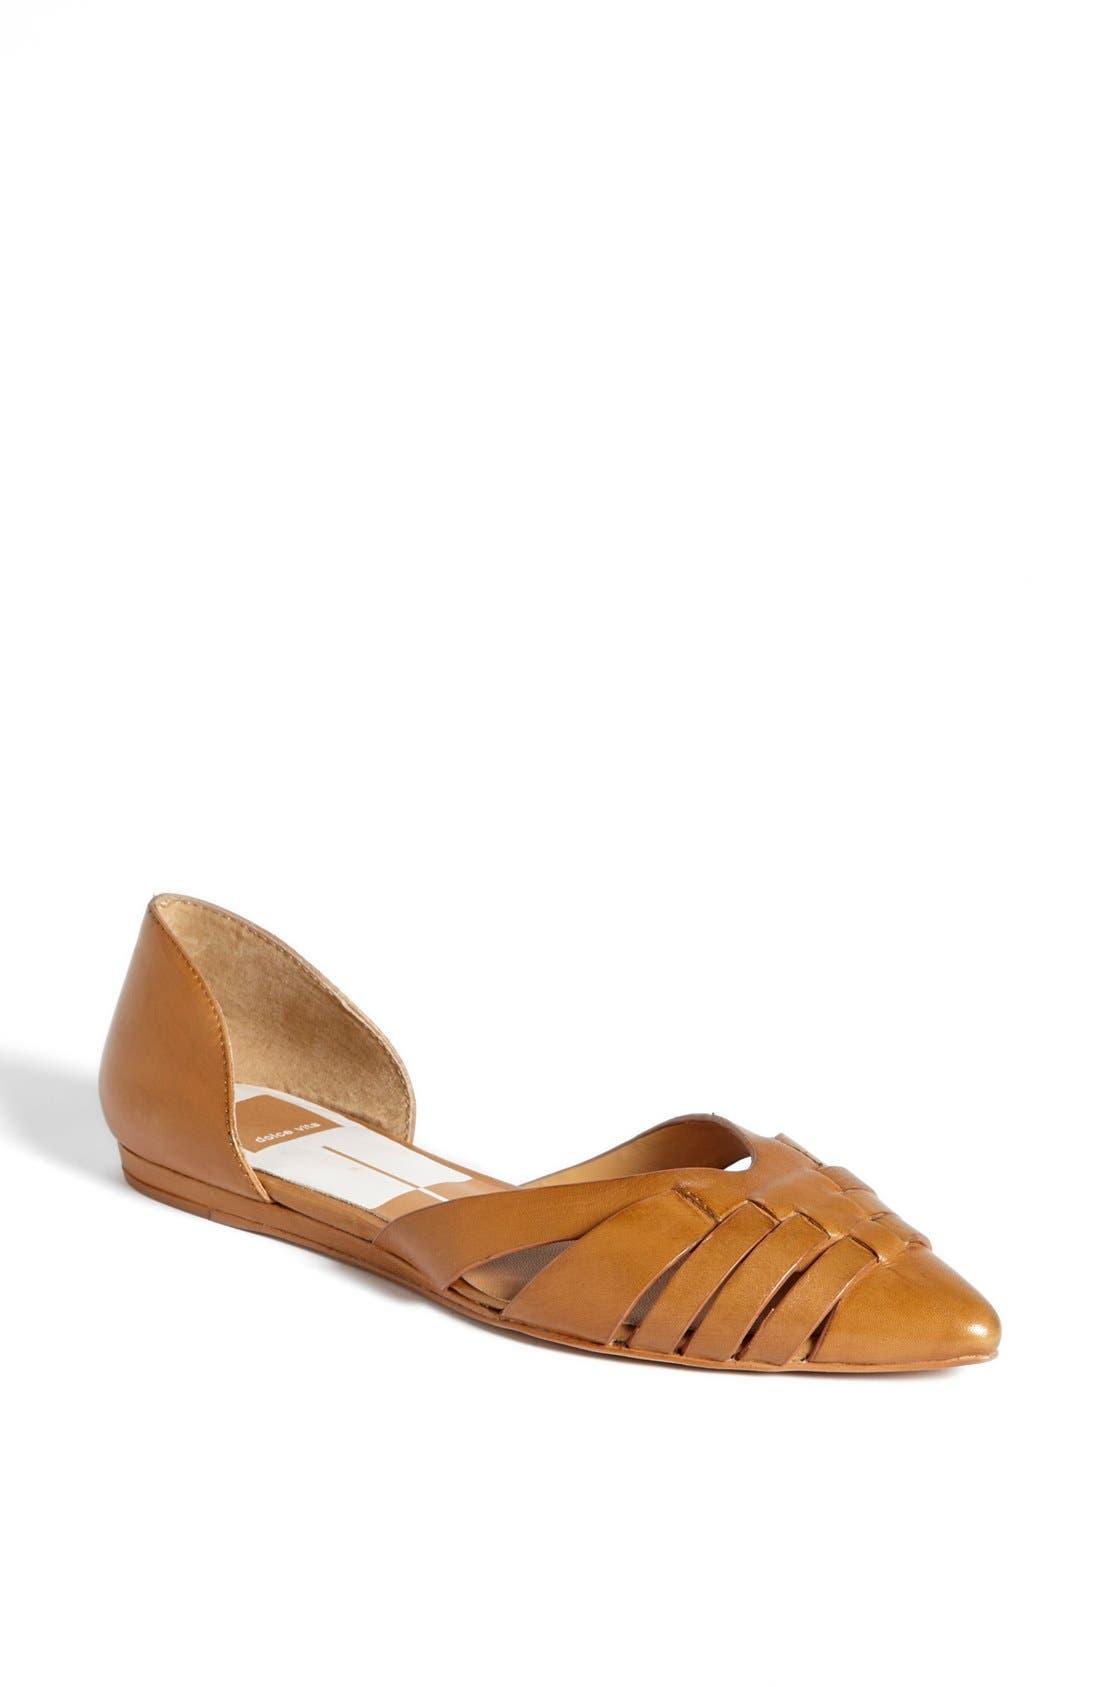 Main Image - Dolce Vita 'Alpha' Leather Flat Sandal